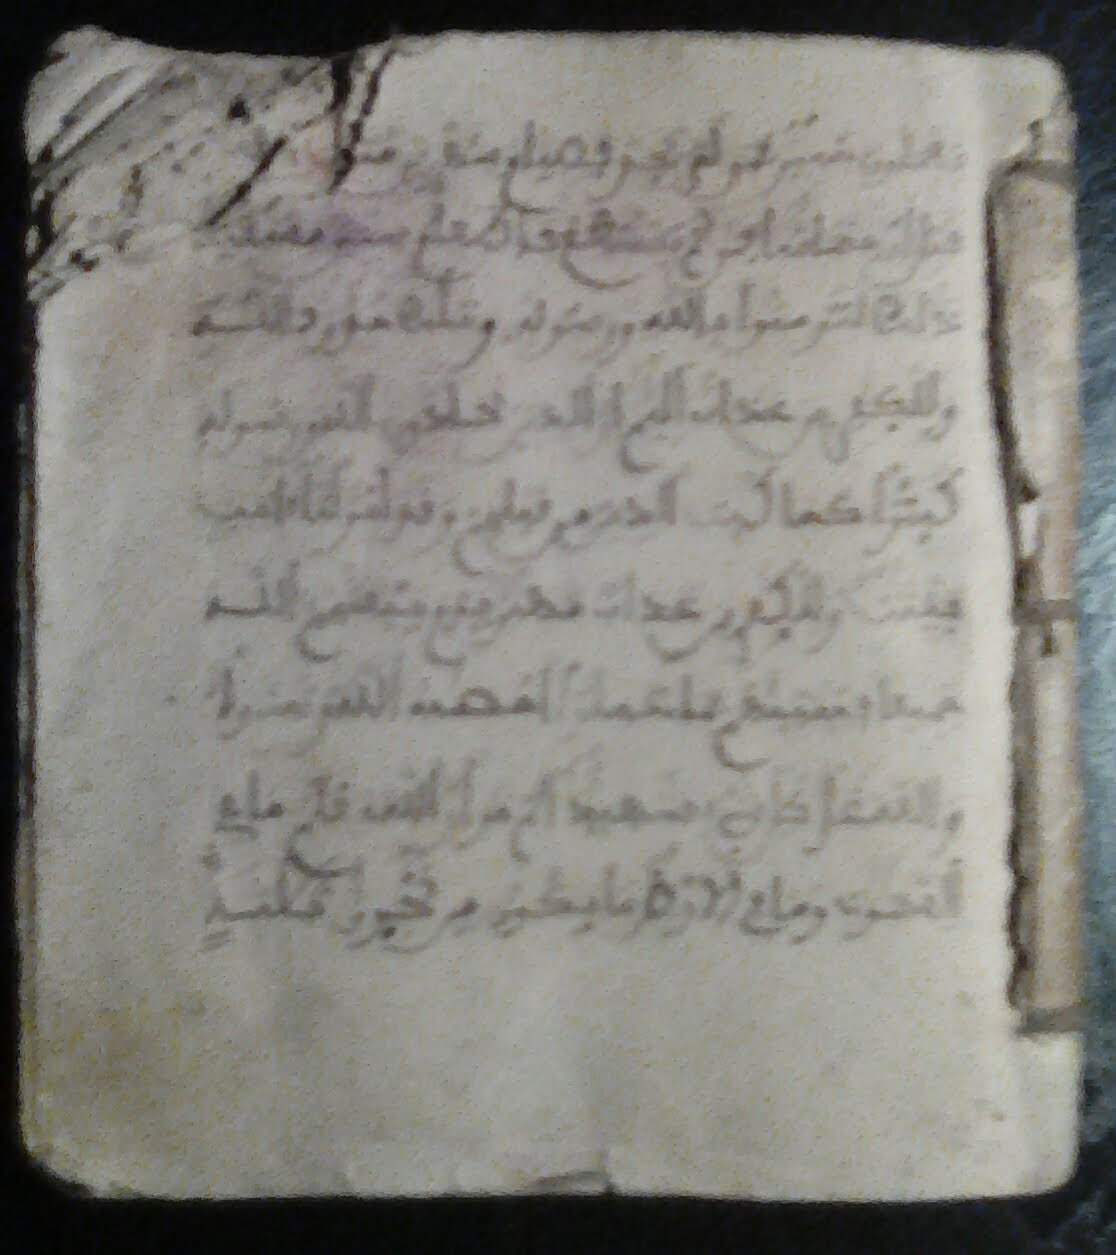 جزء من مصحف مخطوط باليد عمره يتجاوز 150سنةللبيع /Part of a Koran, over 150 years old for sale